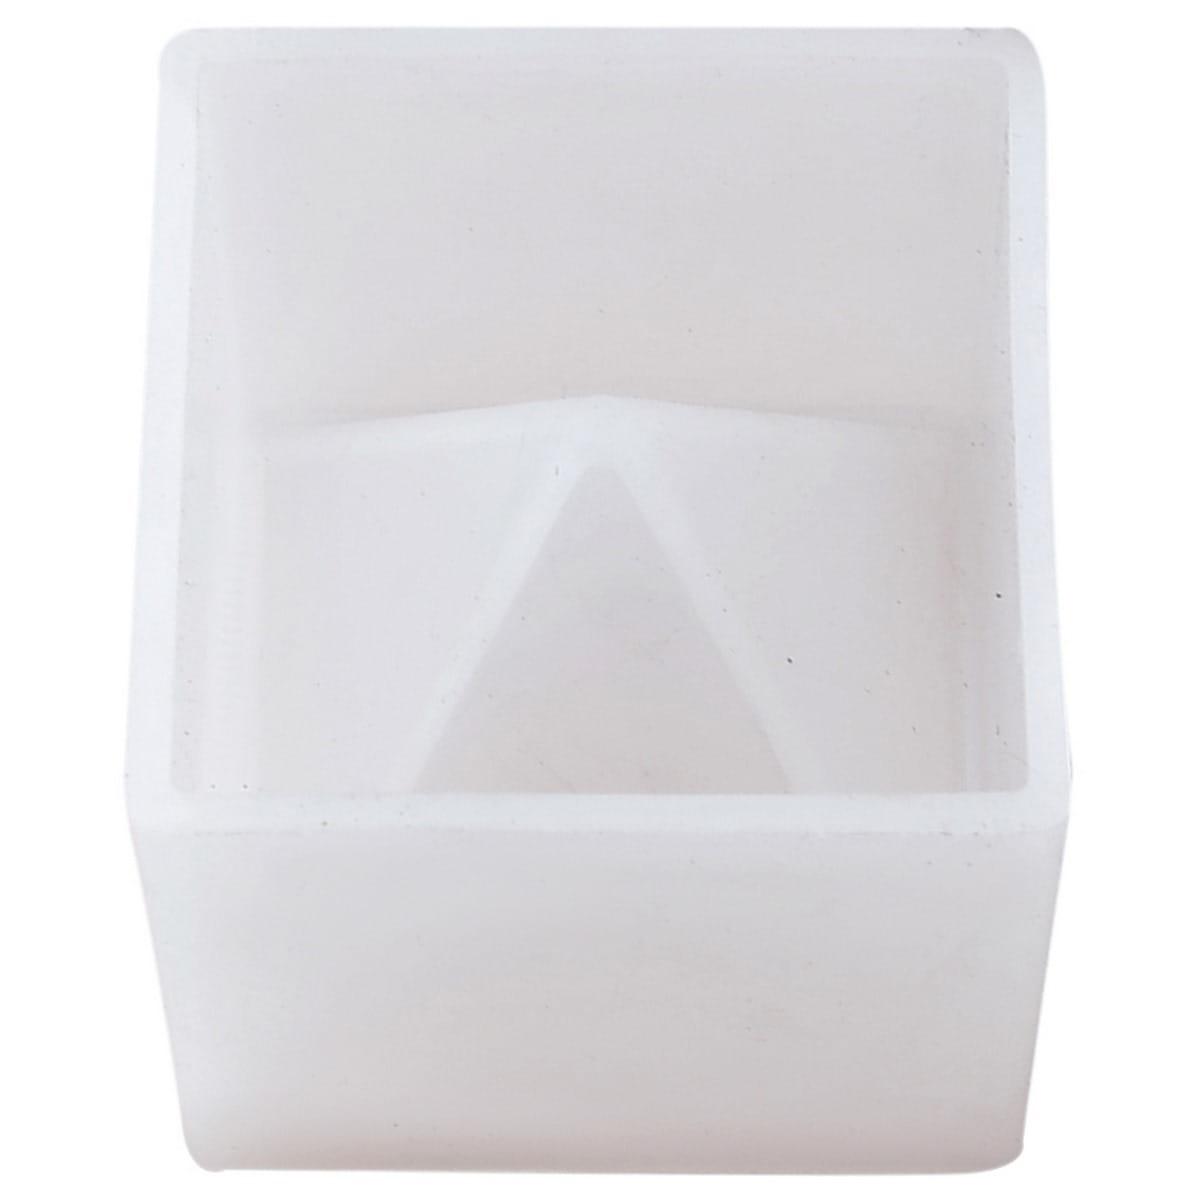 Resin Silicone Mould Pyramid Design